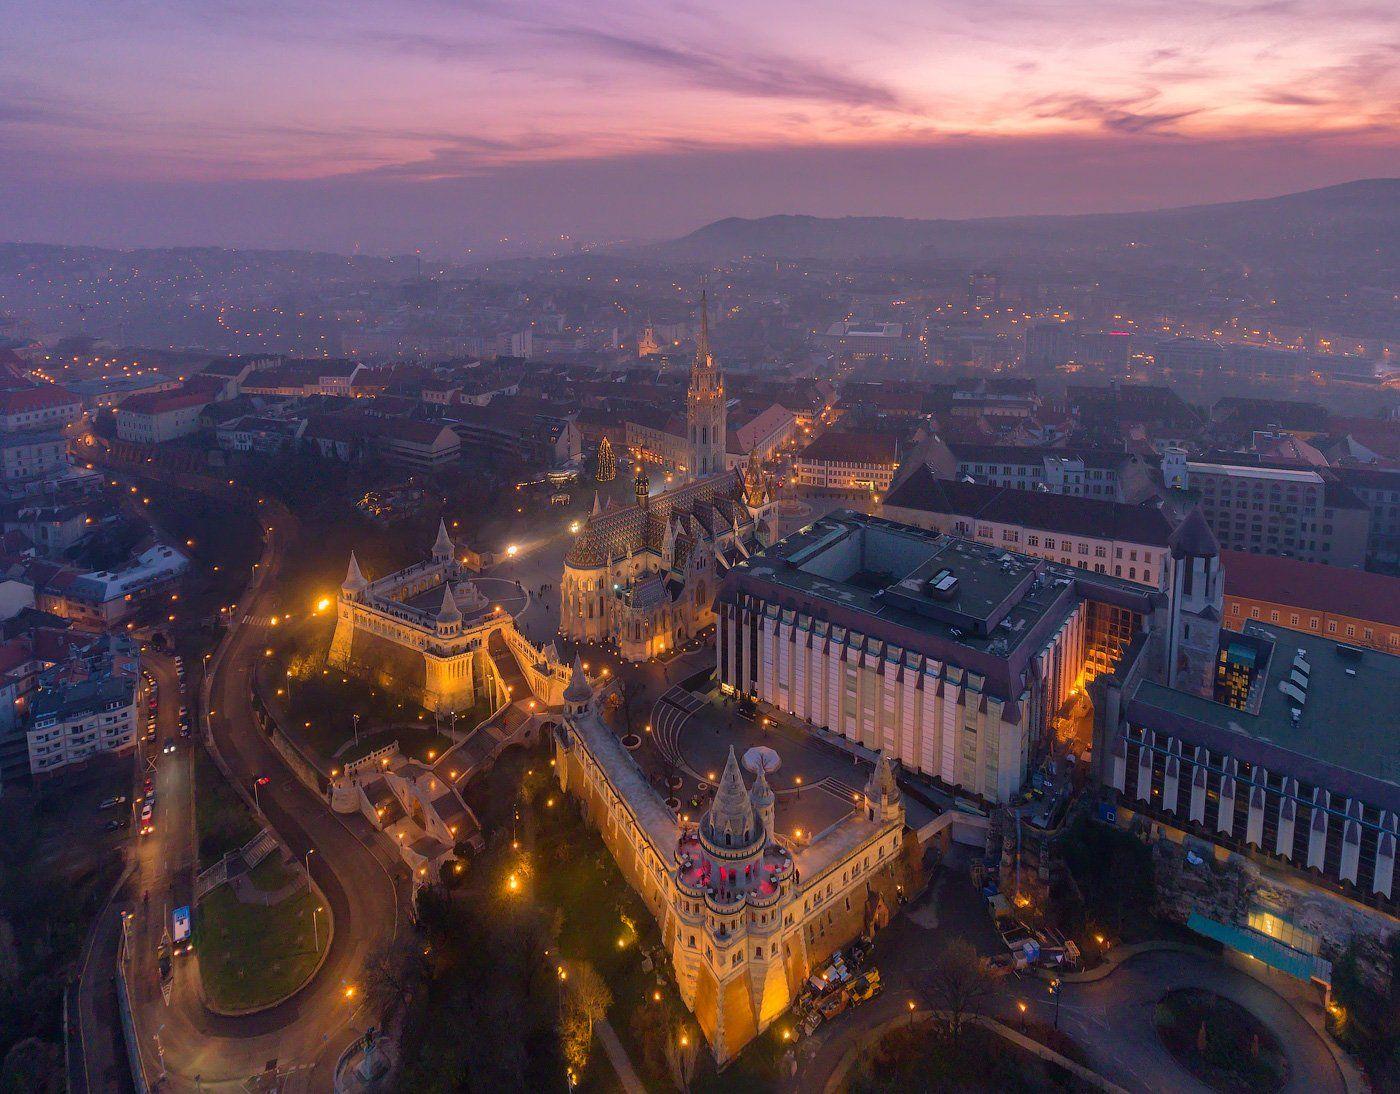 будапешт, венгрия, вudapest, hungary,  dji, phantom 4,, Шевченко Юрий (Phototours.pro)